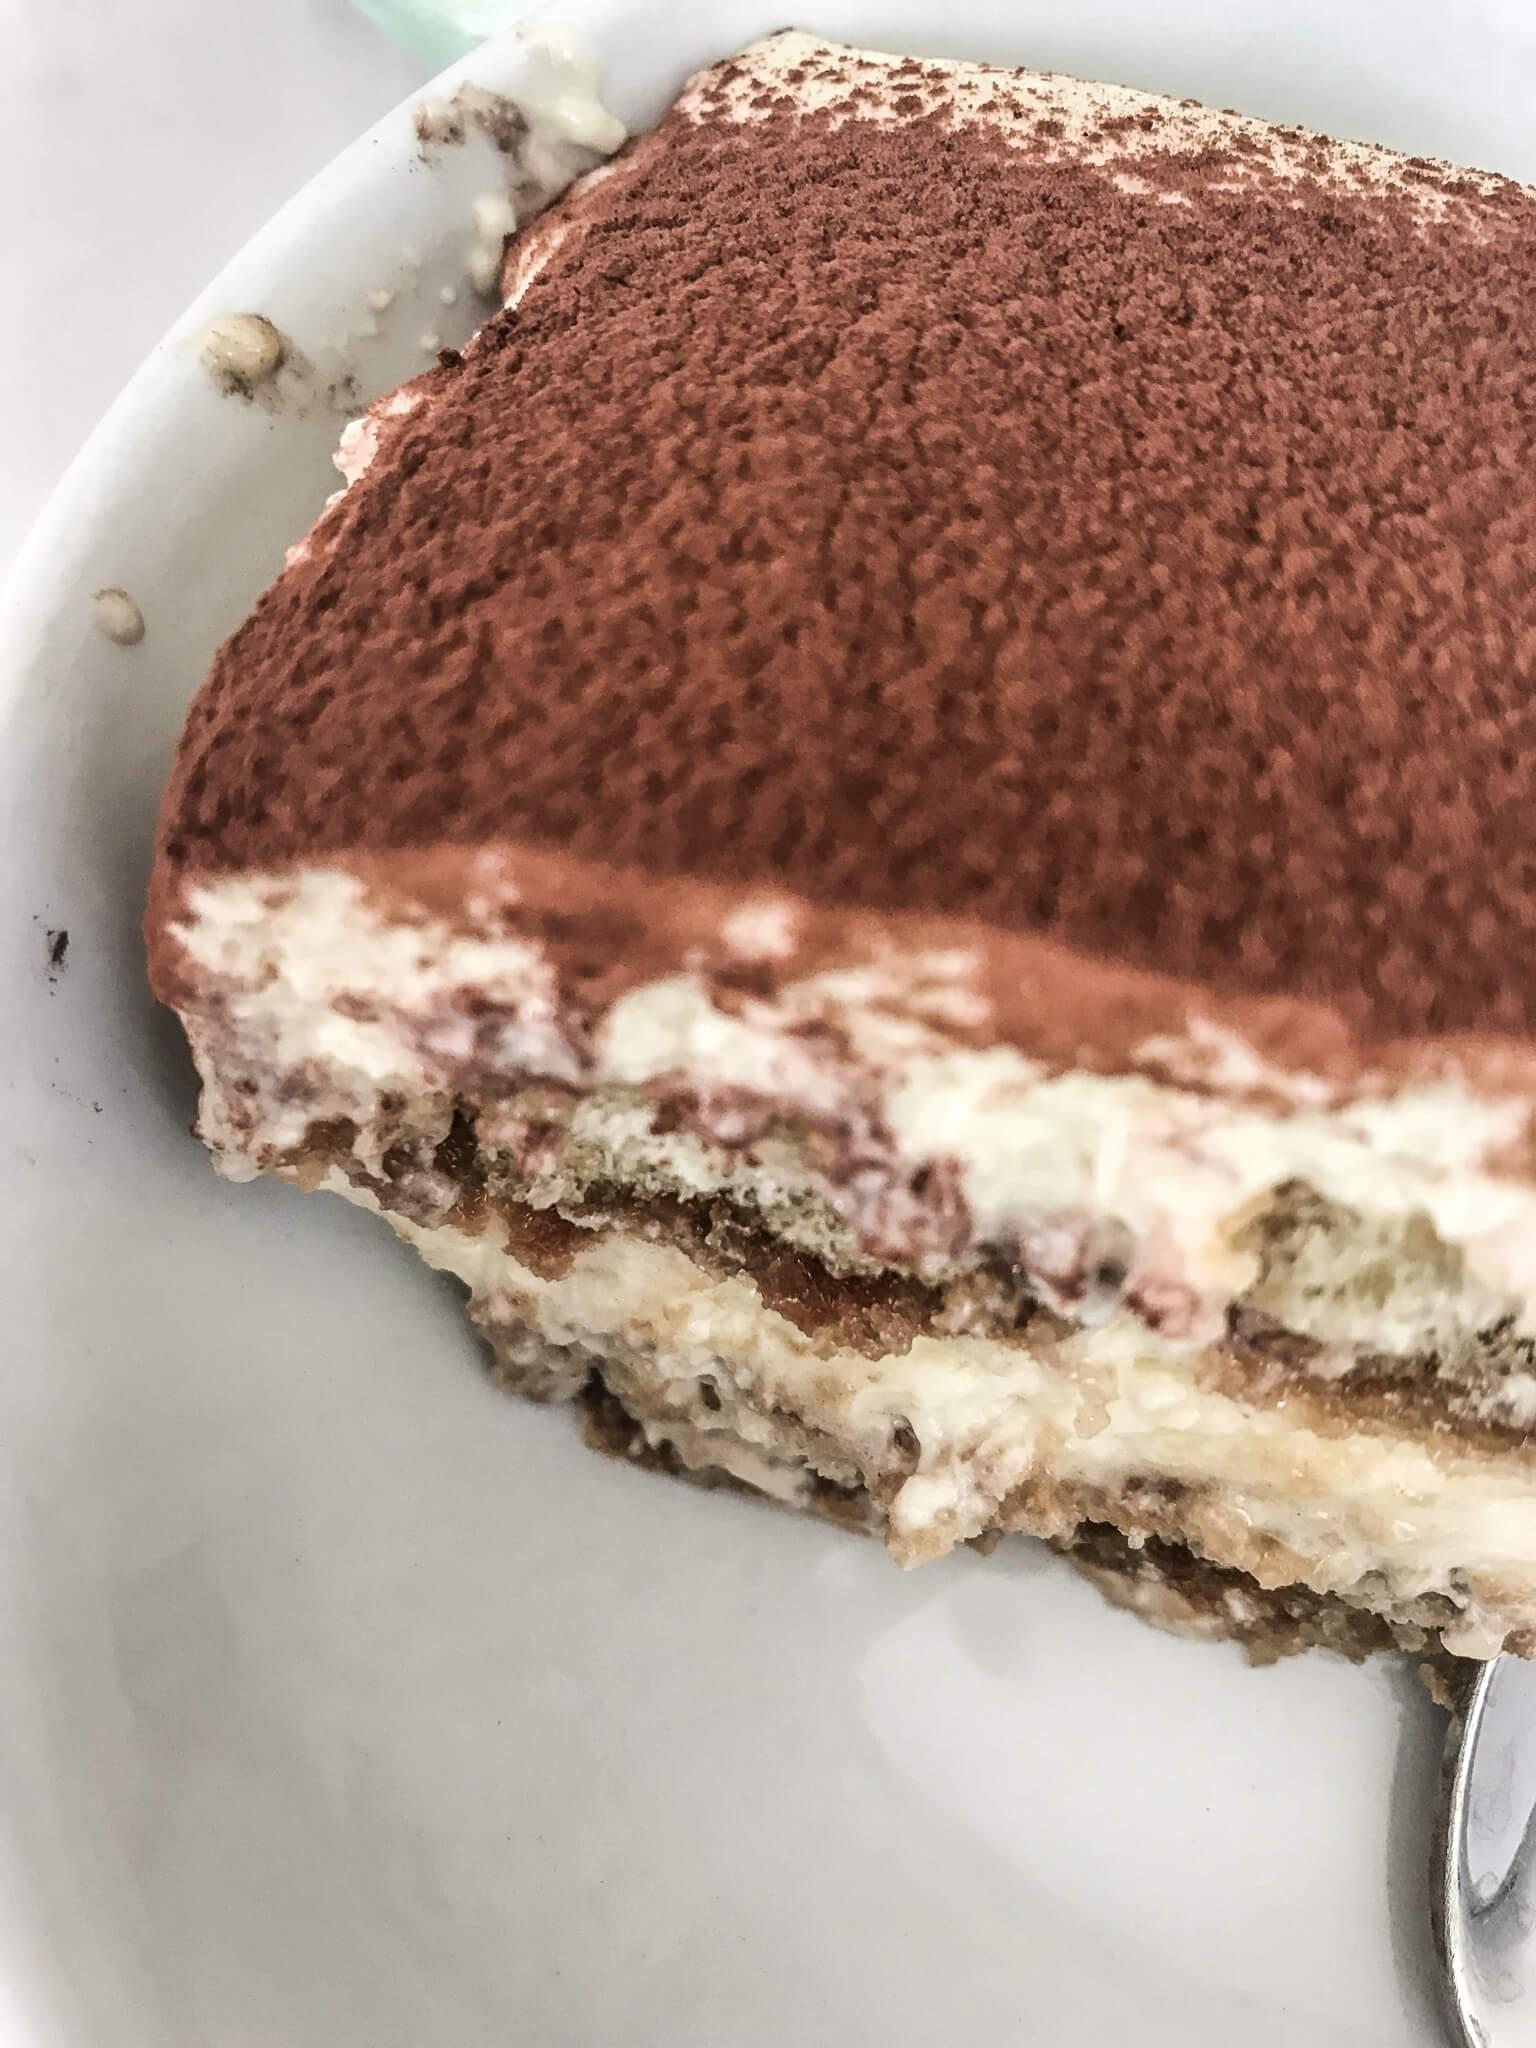 Tiramisu www.sarahkayhoffman.com #tiramisu #dessert #italy